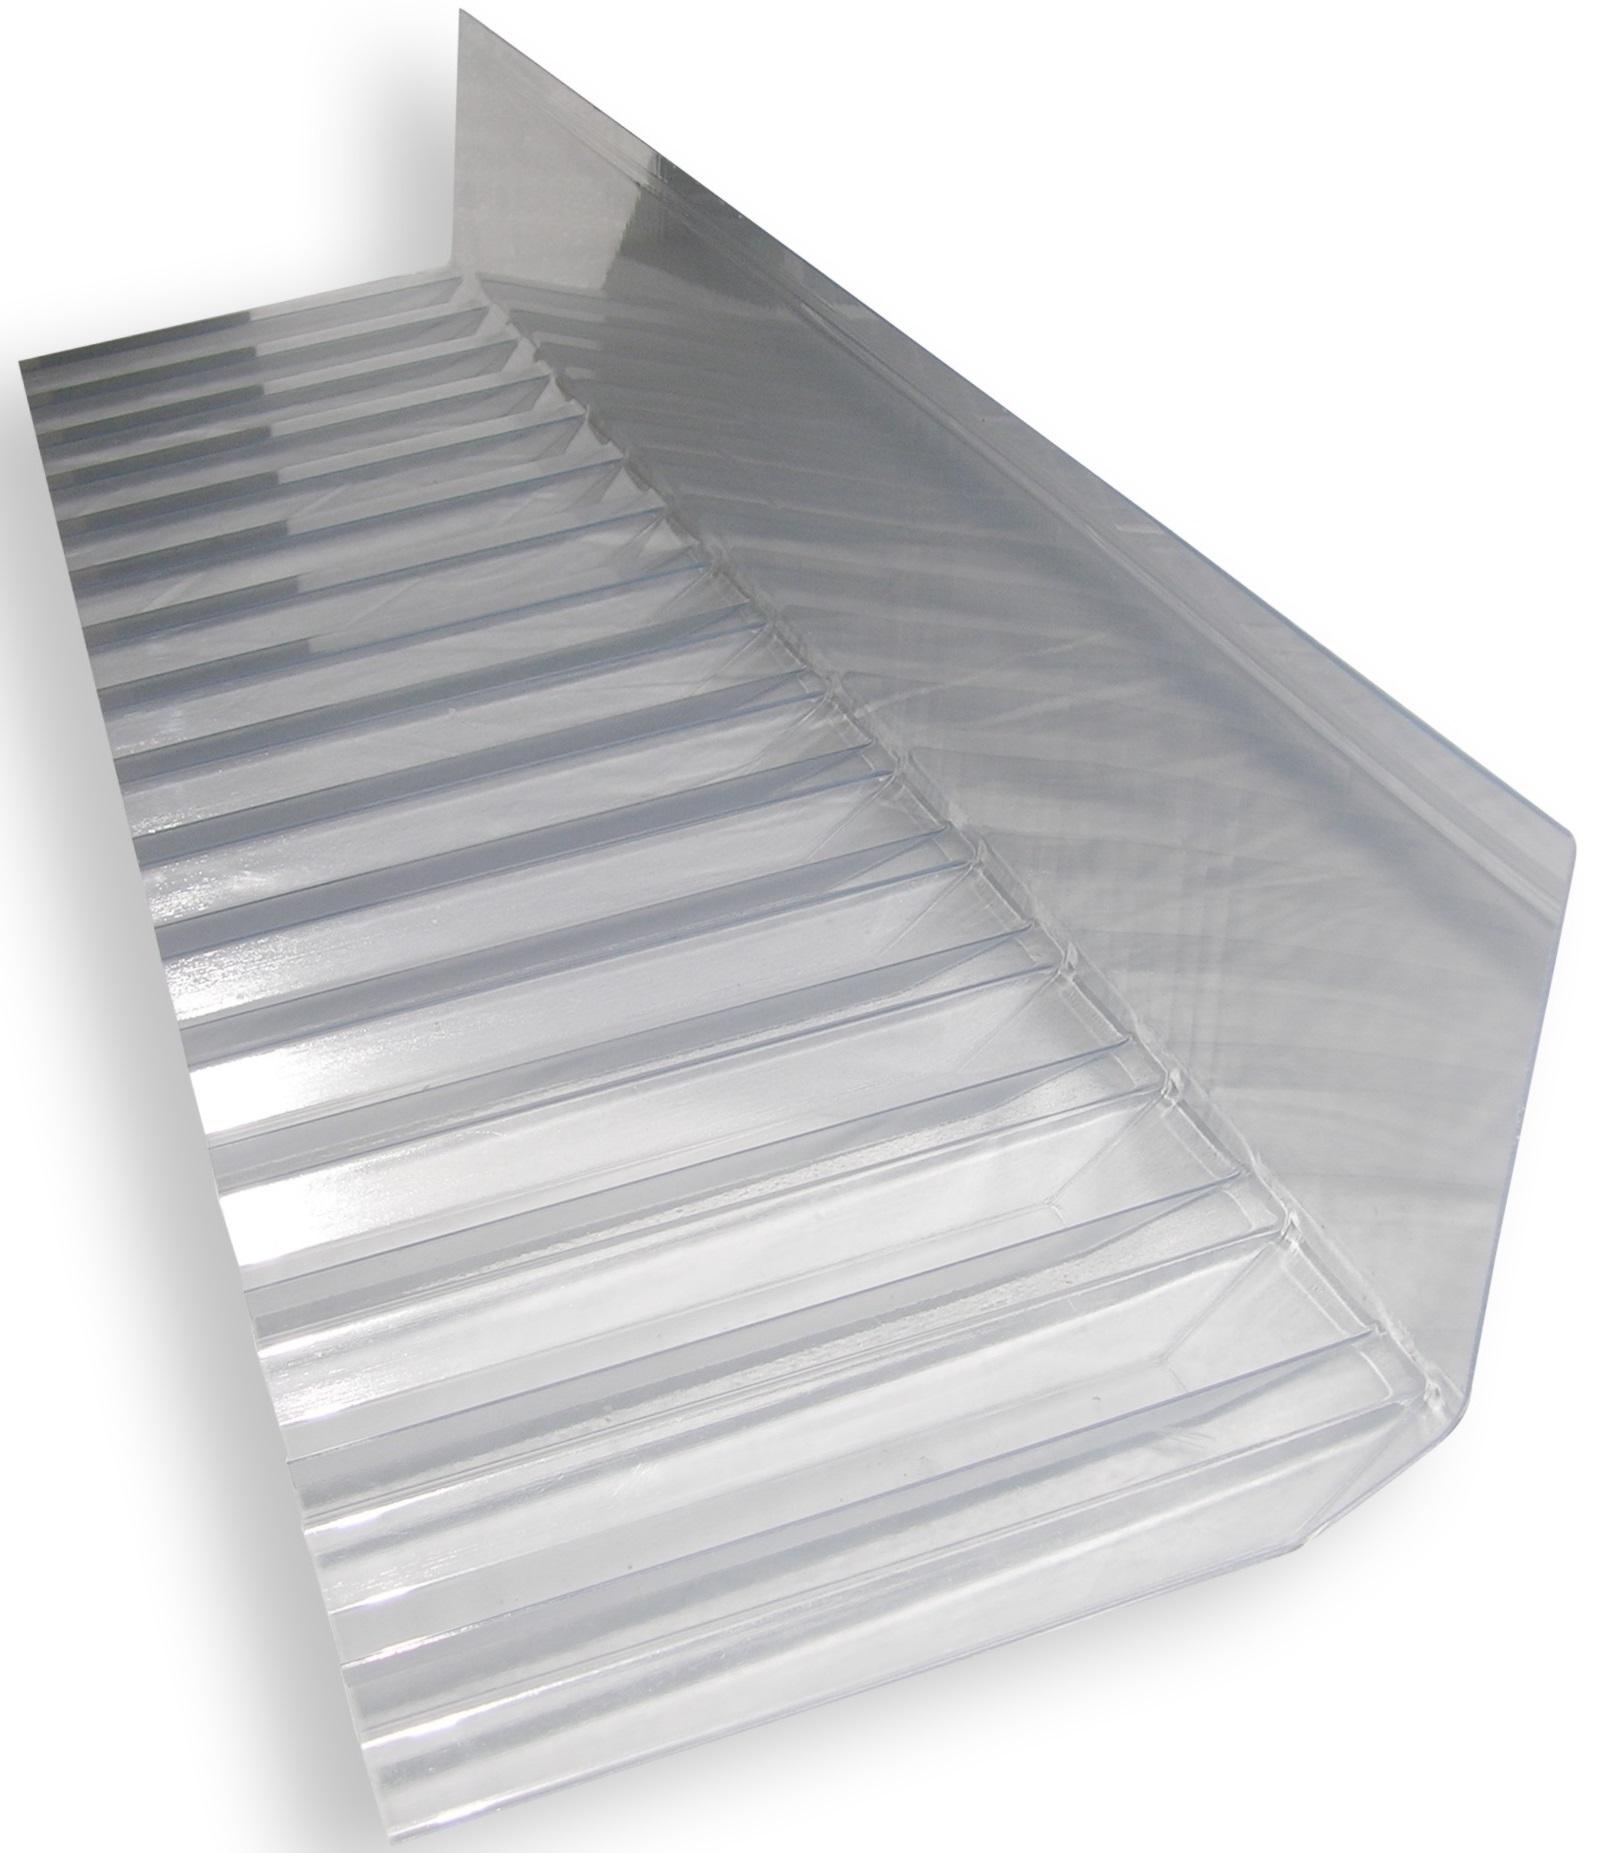 Berühmt PVC Wellplatten ONDEX: Wellplatte PVC ONDEX Super HR Trapez 70/18 BM87